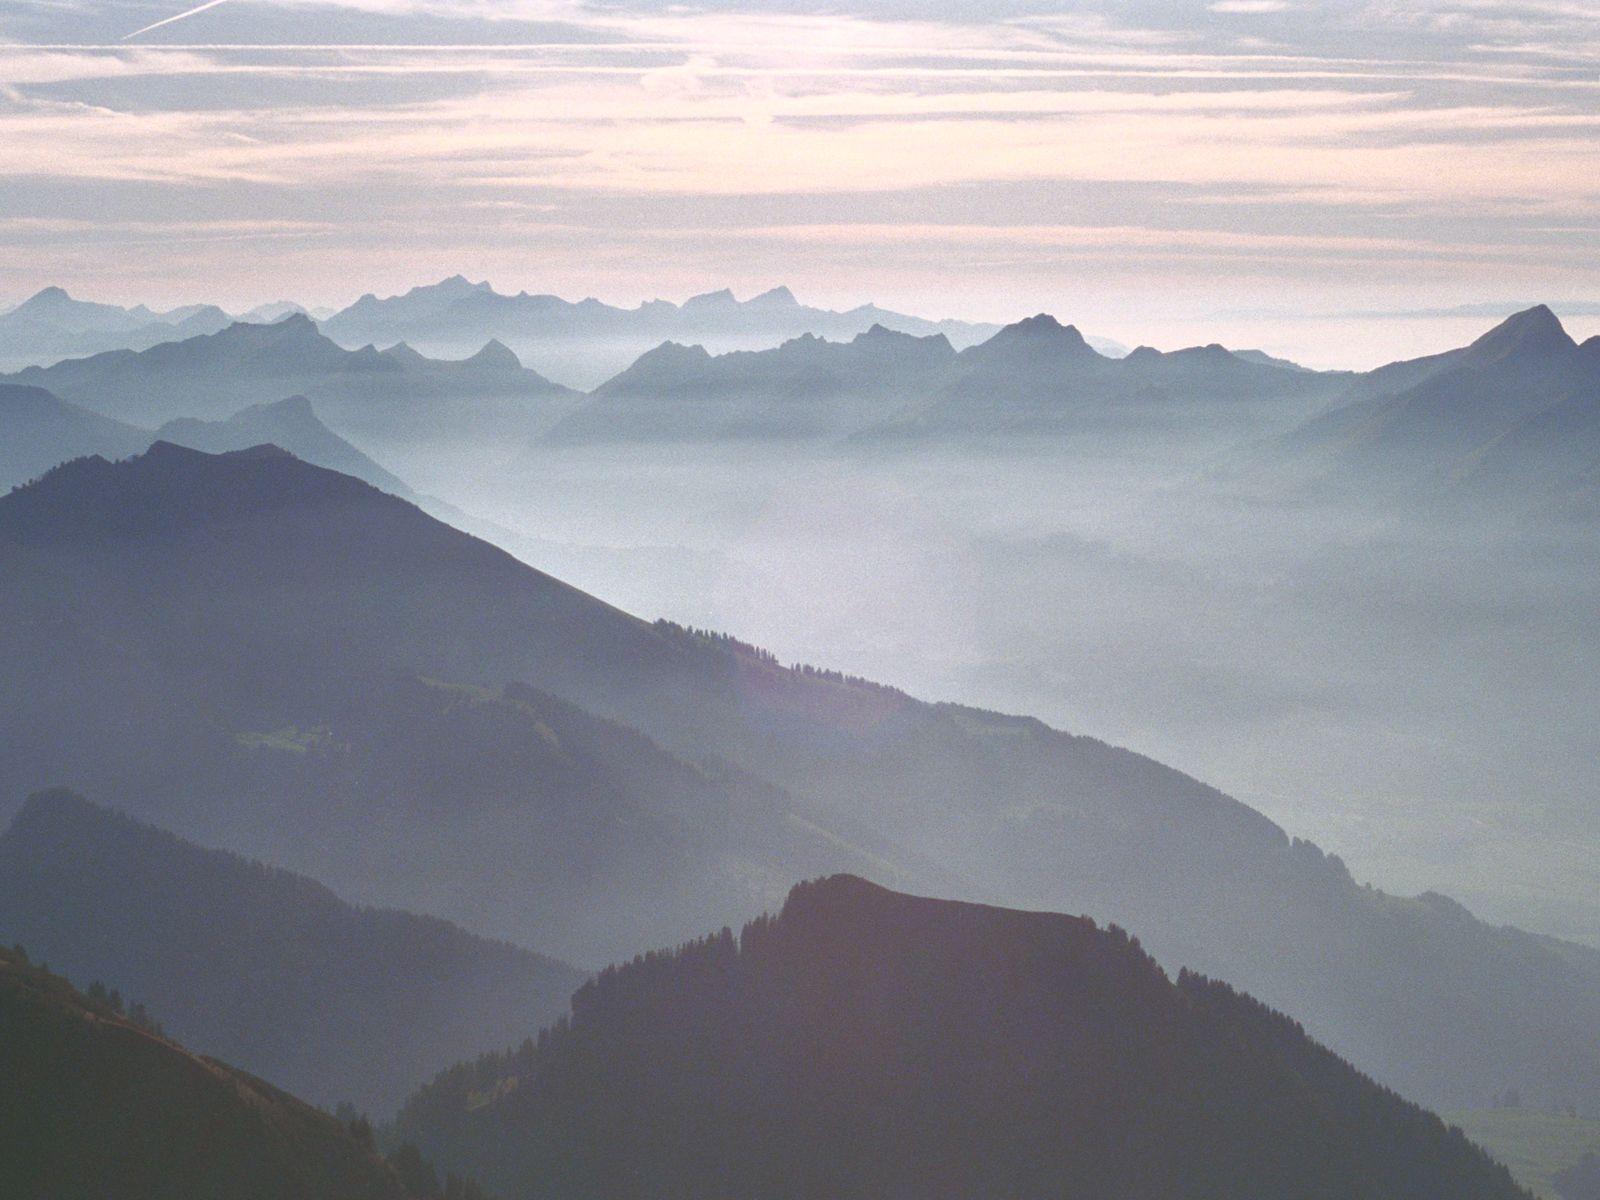 Mountain Fog wallpaper – wallpaper free download